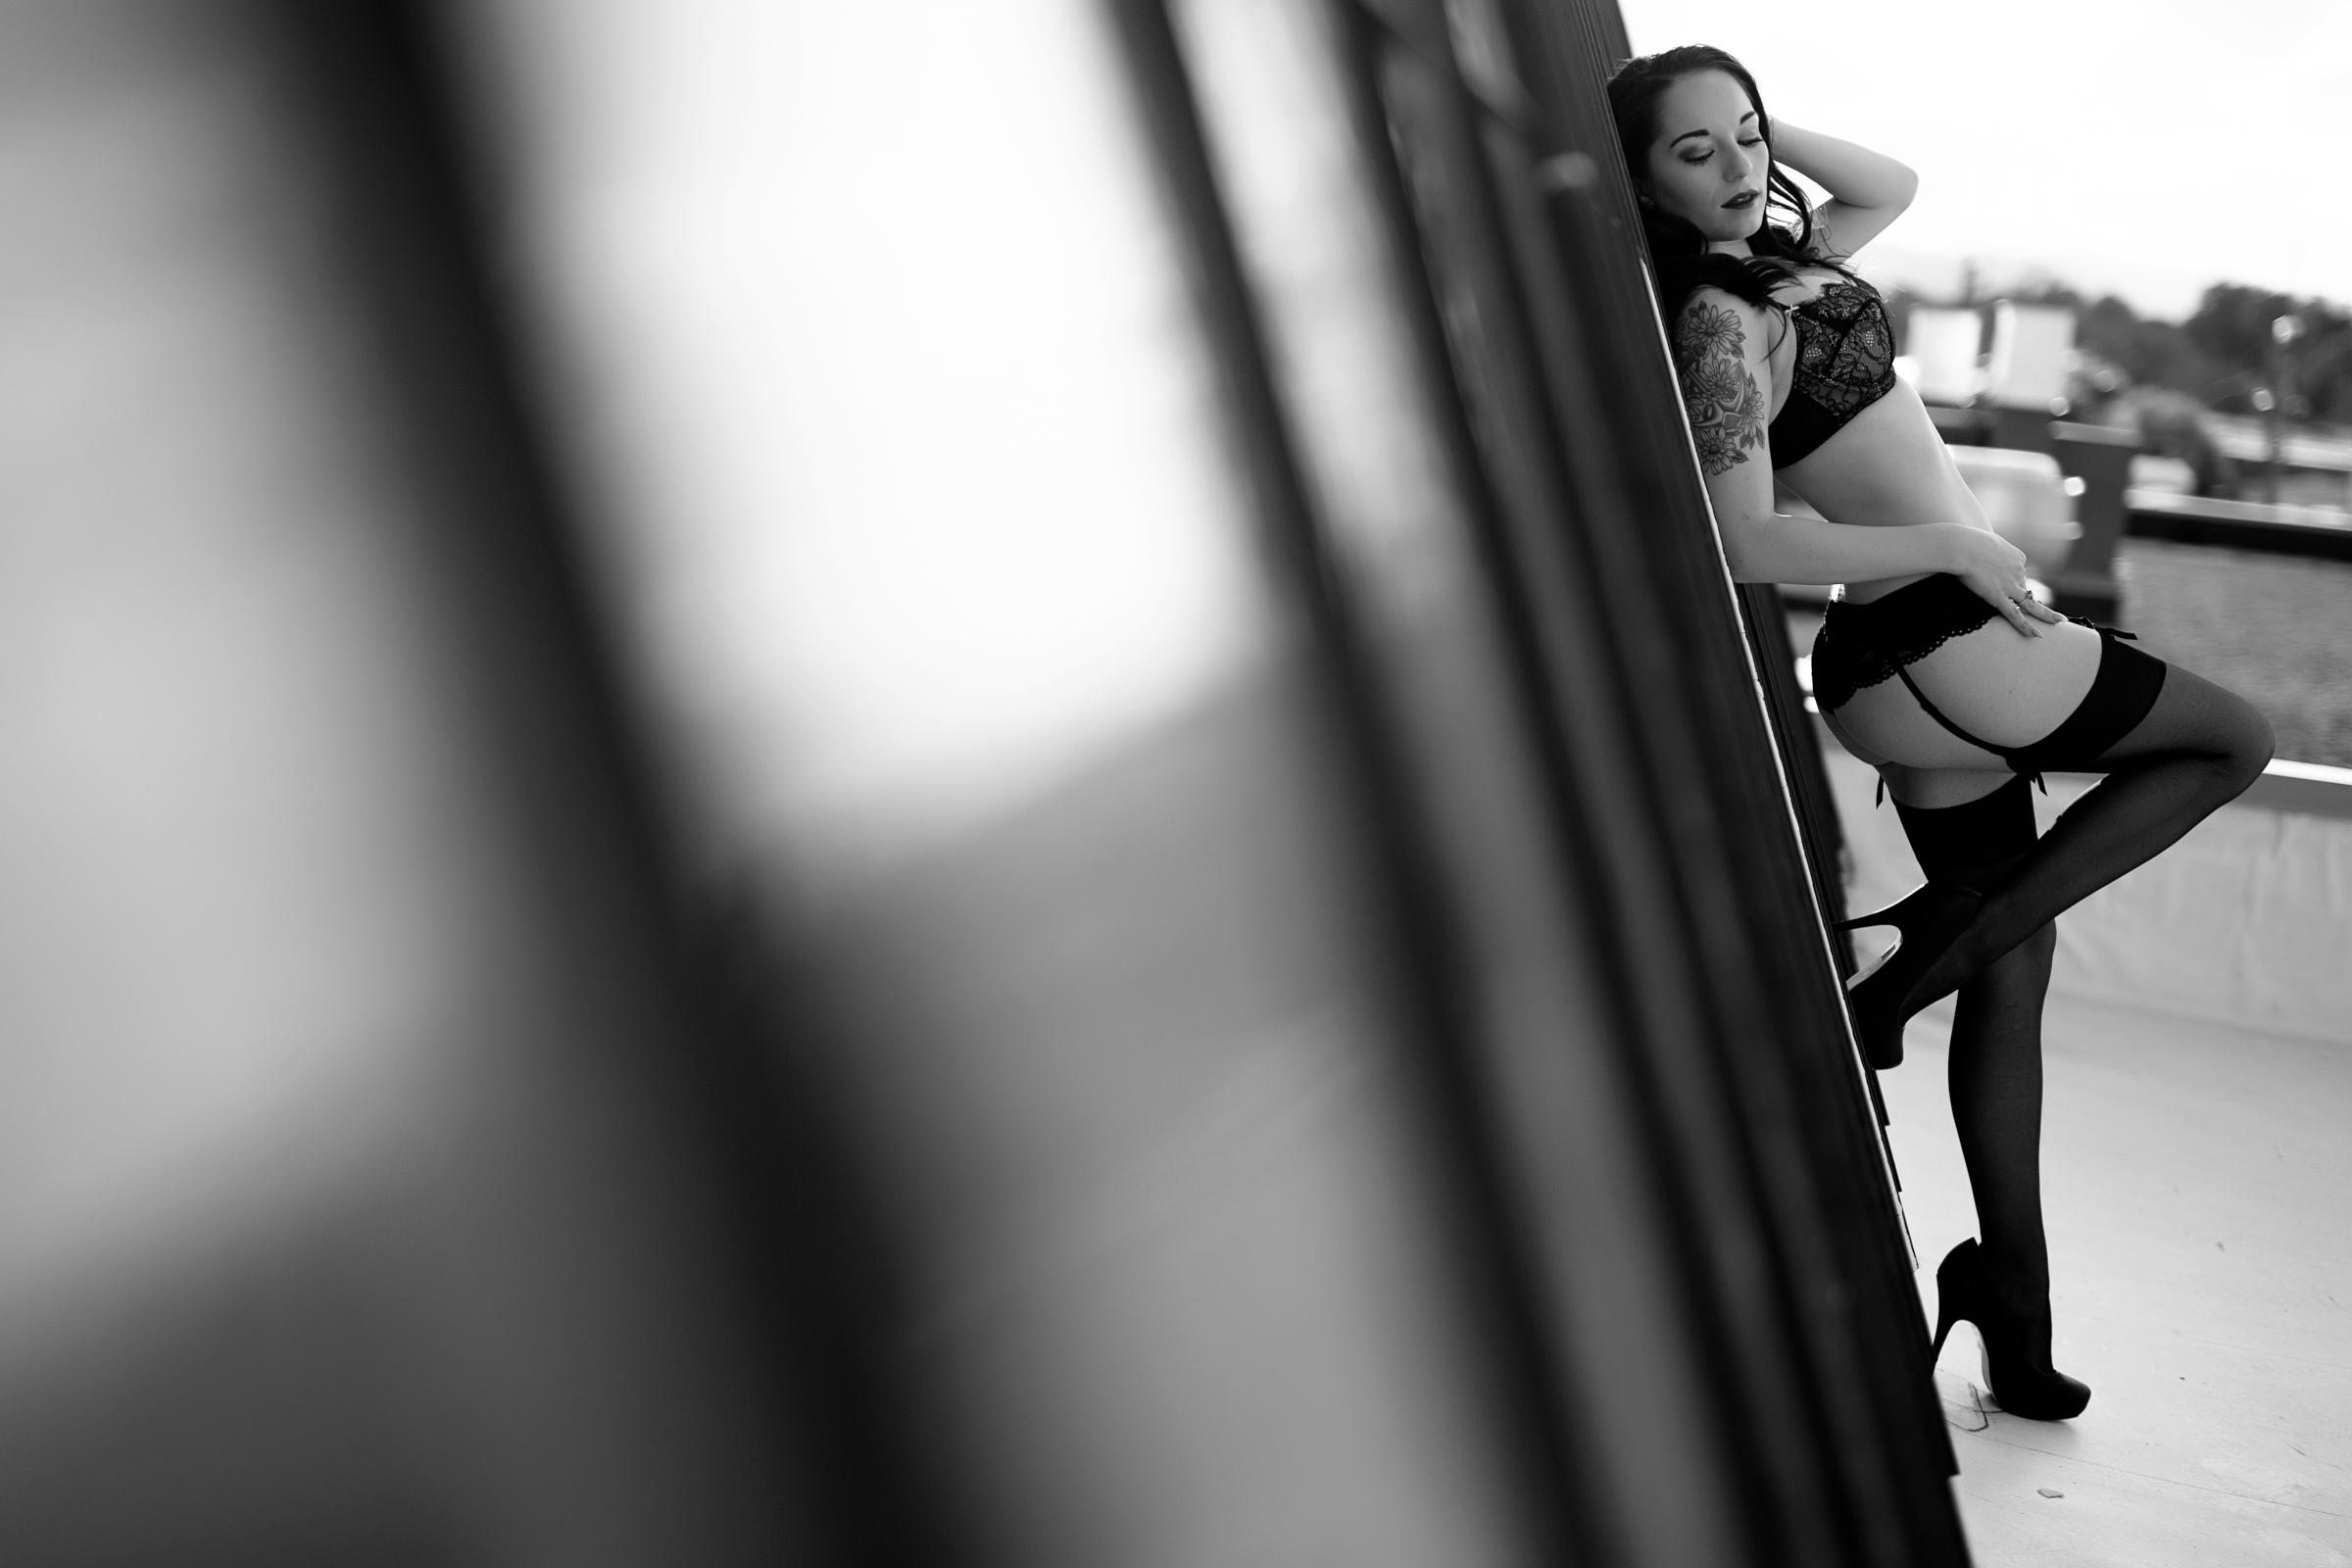 denver-boudoir-photographer, destination-boudoir, denver-boudoir-photography, denver-boudoir-photos, denver-boudoir, colorado-boudoir, outdoor-boudoir, denver-sexy-photos, top-denver-boudoir, destination-boudoir-photographer, travel-boudoir-photographer, colorado-outdoor-boudoir